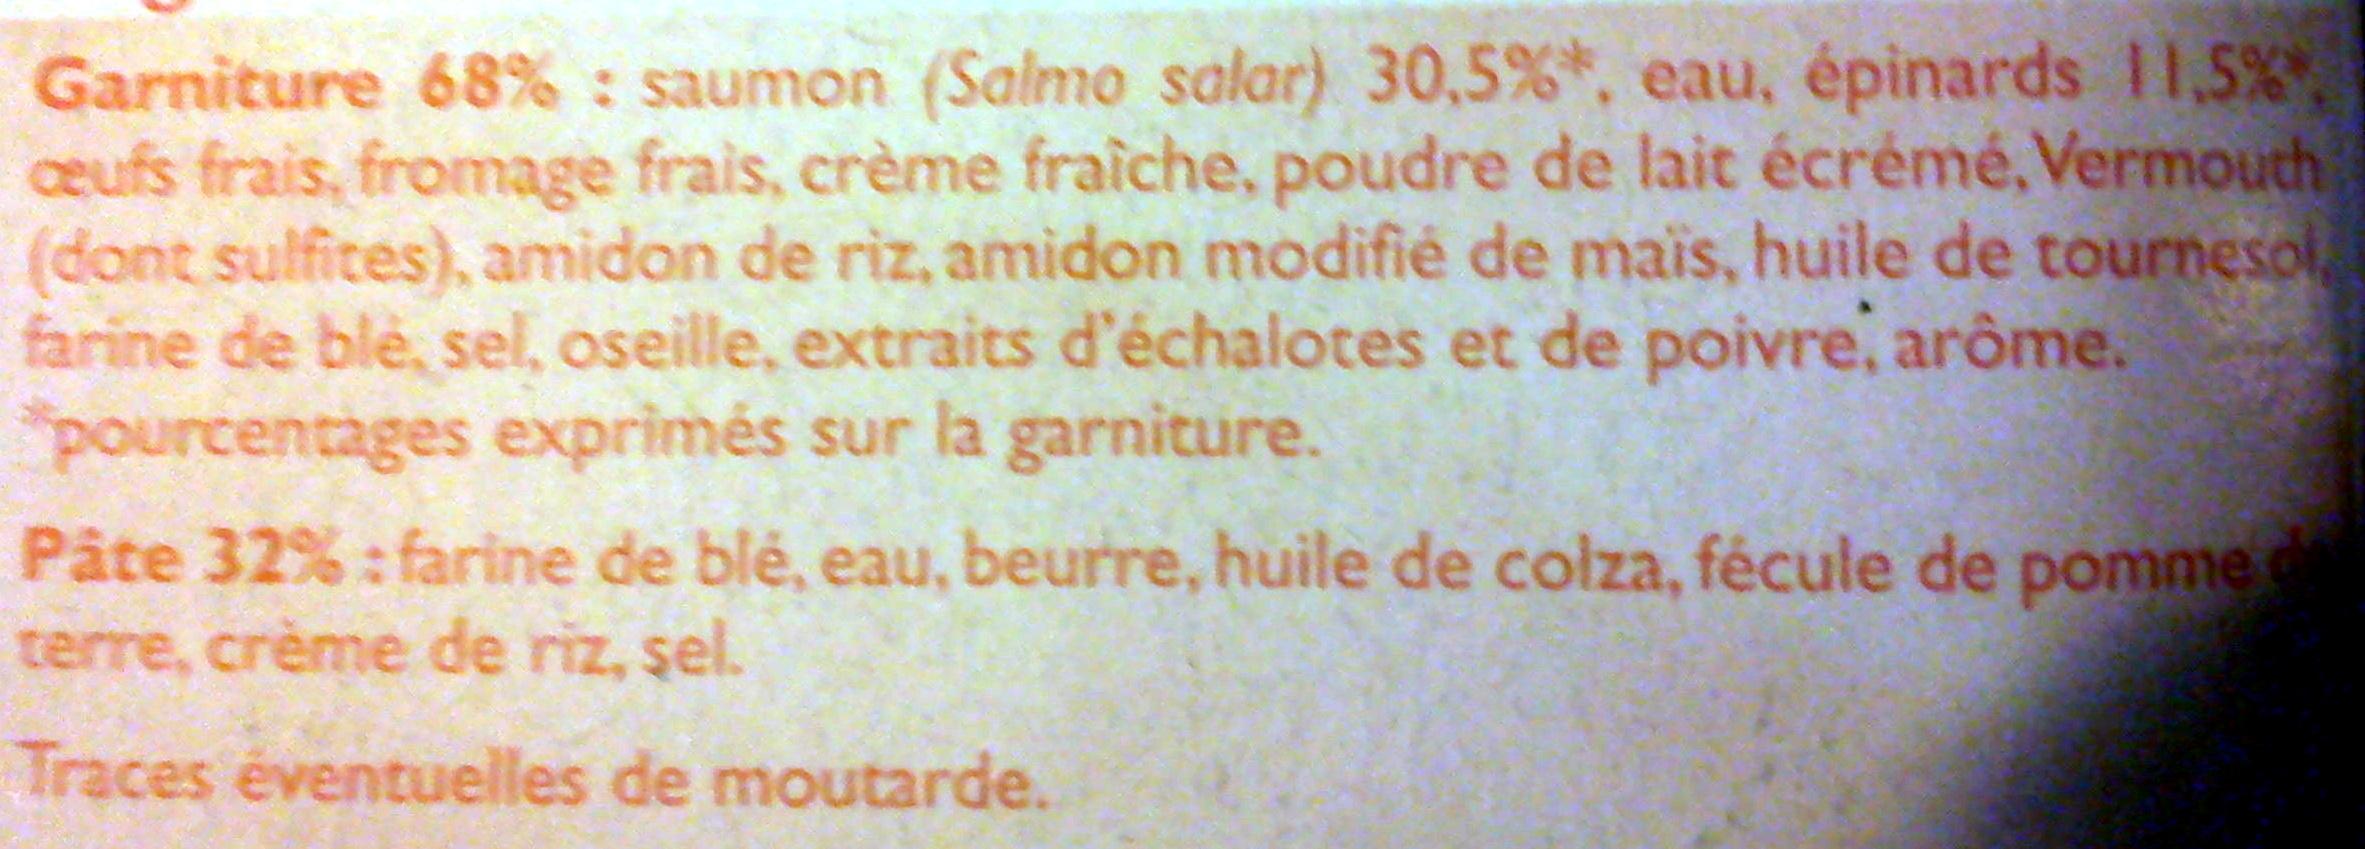 Tarte saumon épinards - Ingrediënten